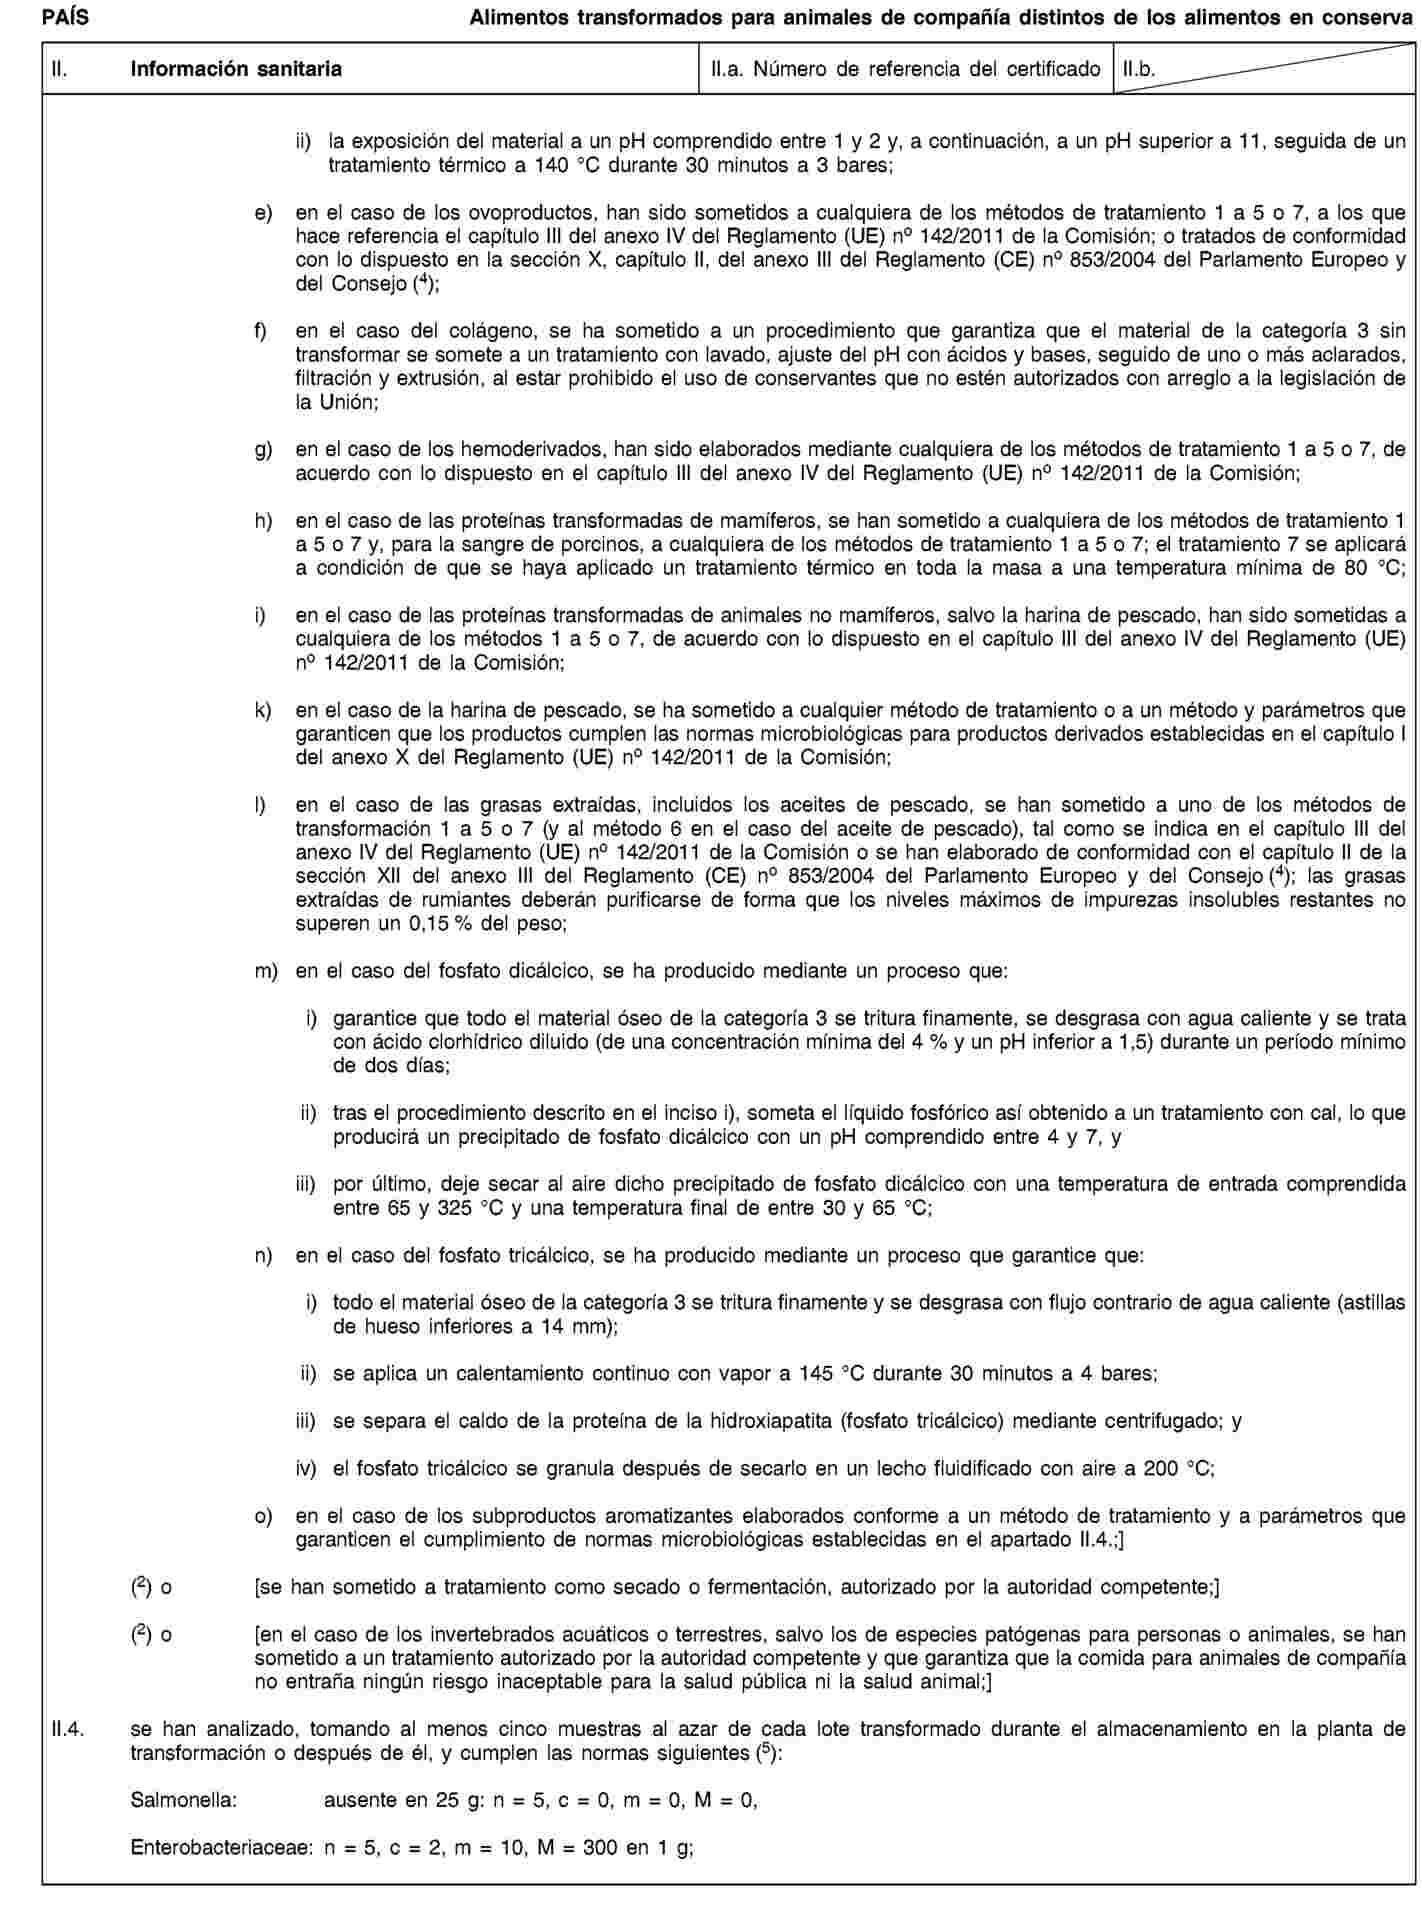 Imagen: https://eur-lex.europa.eu/resource.html?uri=uriserv:OJ.L_.2011.054.01.0001.01.SPA.xhtml.L_2011054ES.01013901.tif.jpg